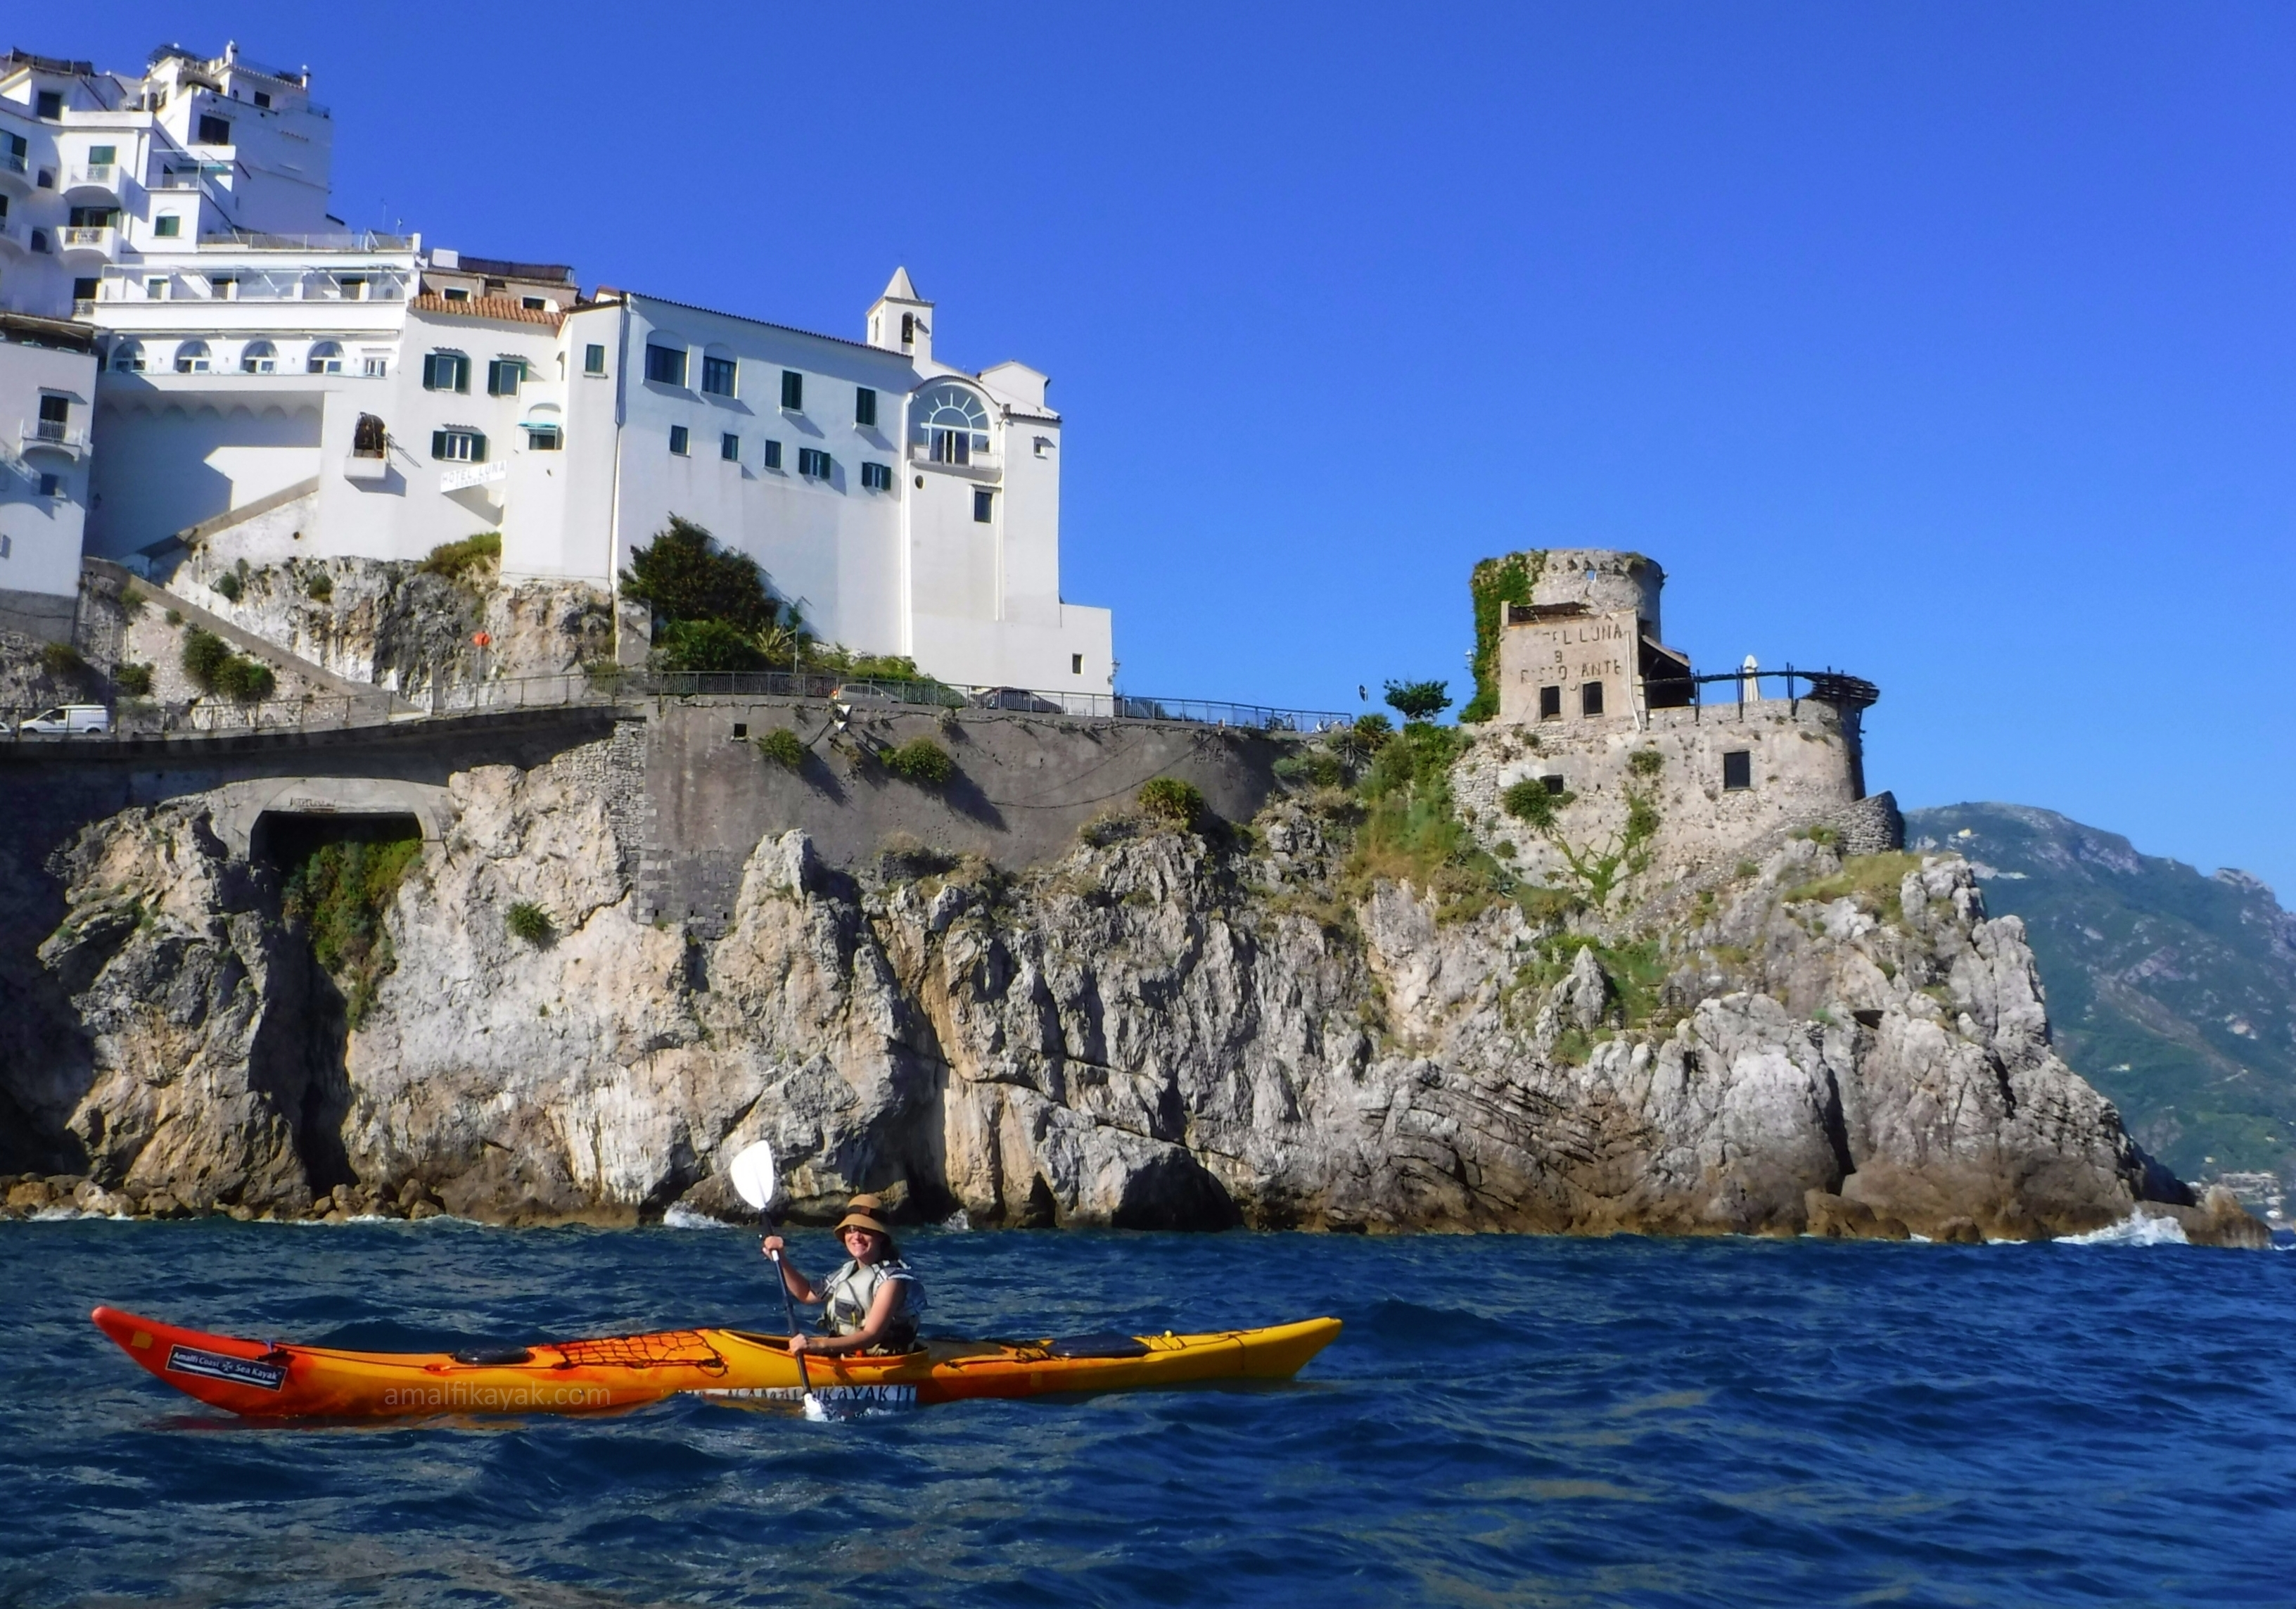 Hotel Luna, Convent - Amalfi Kayak